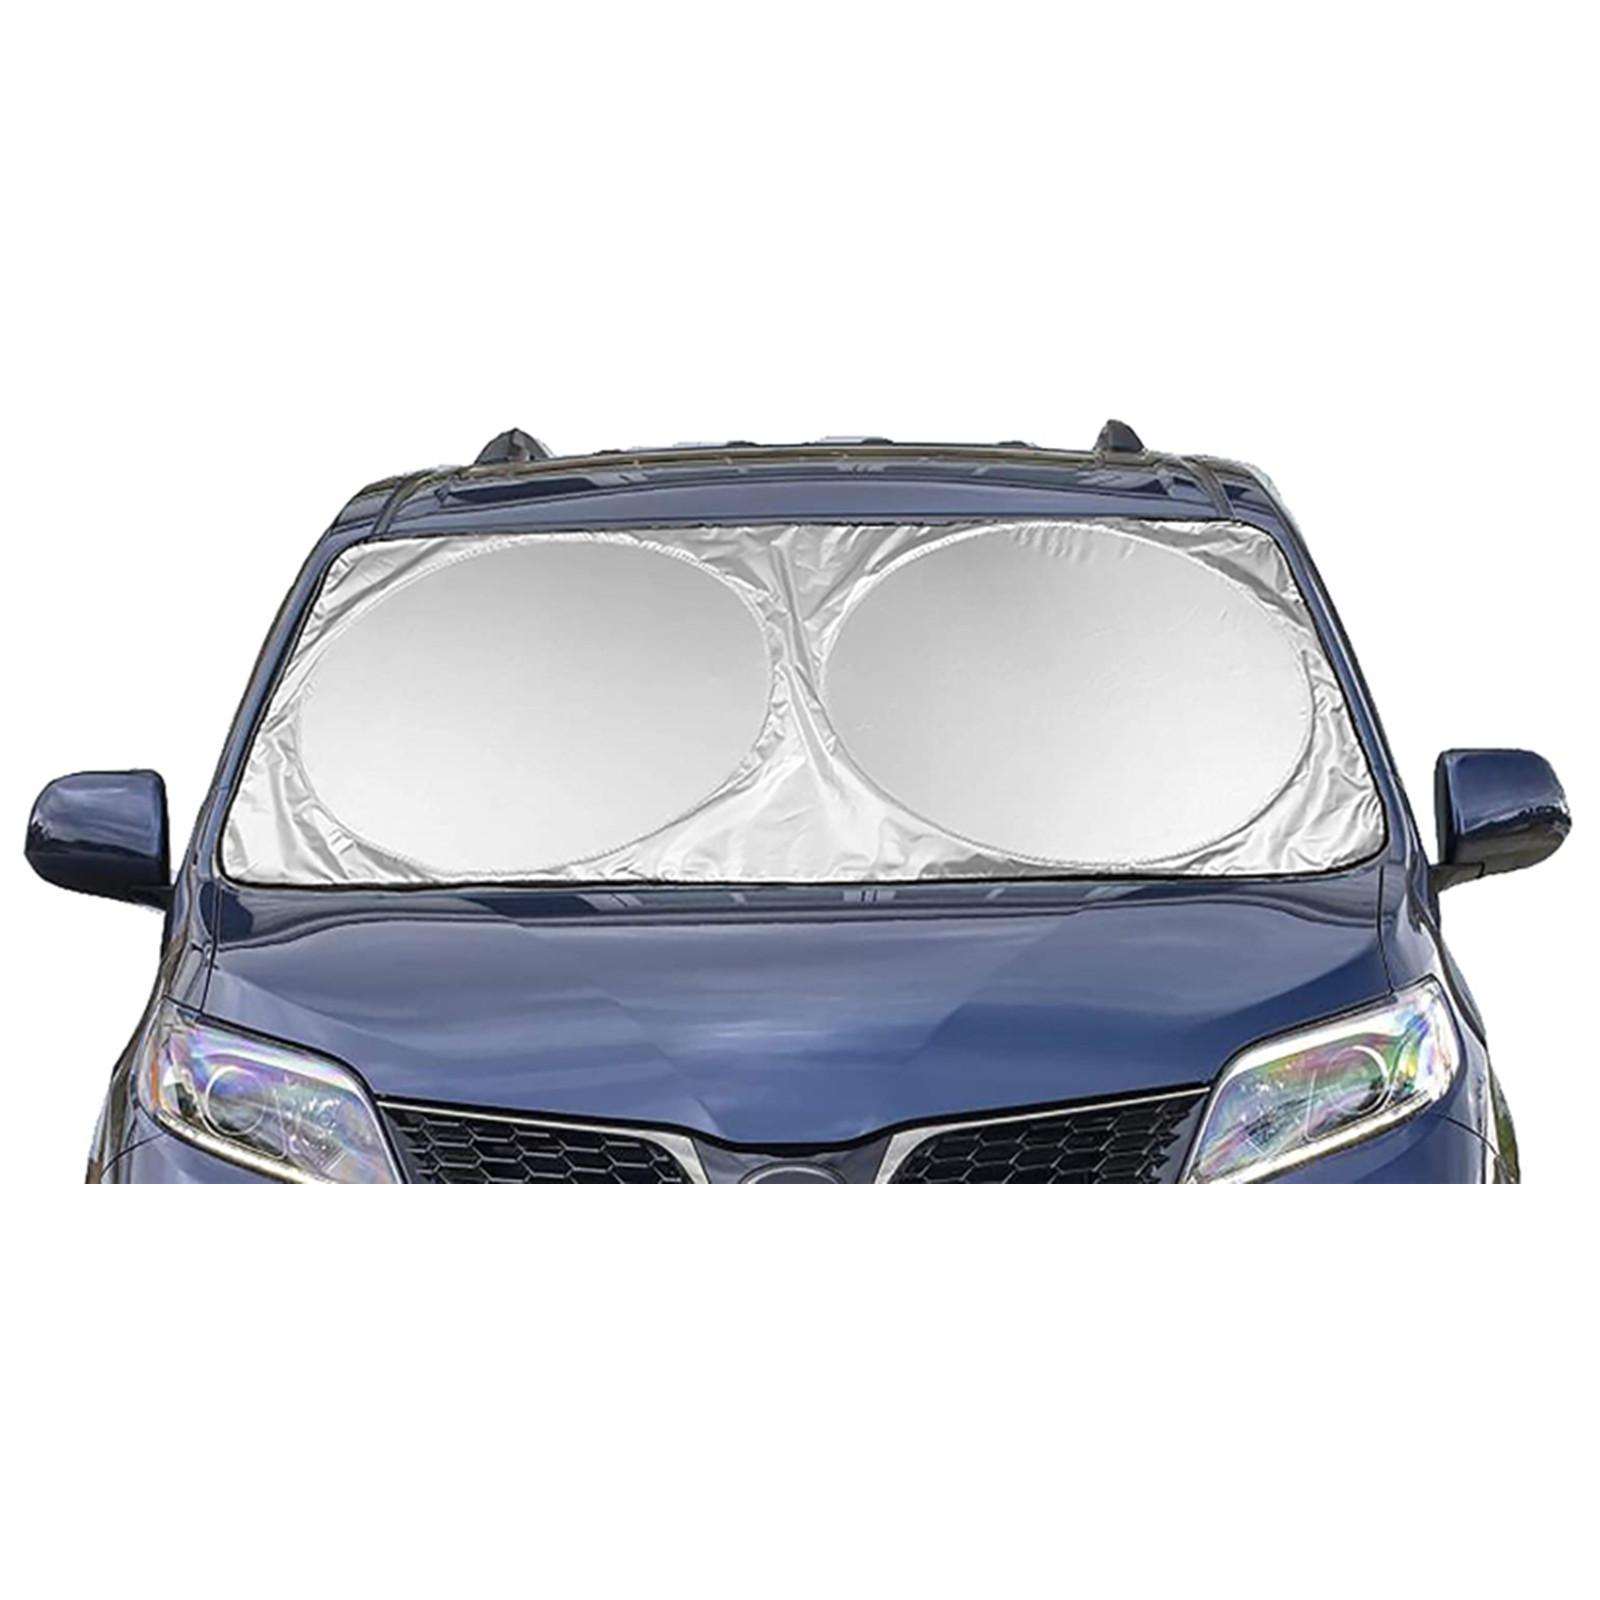 [US Direct] Extra Large Car Windshield Sunshade (70.9